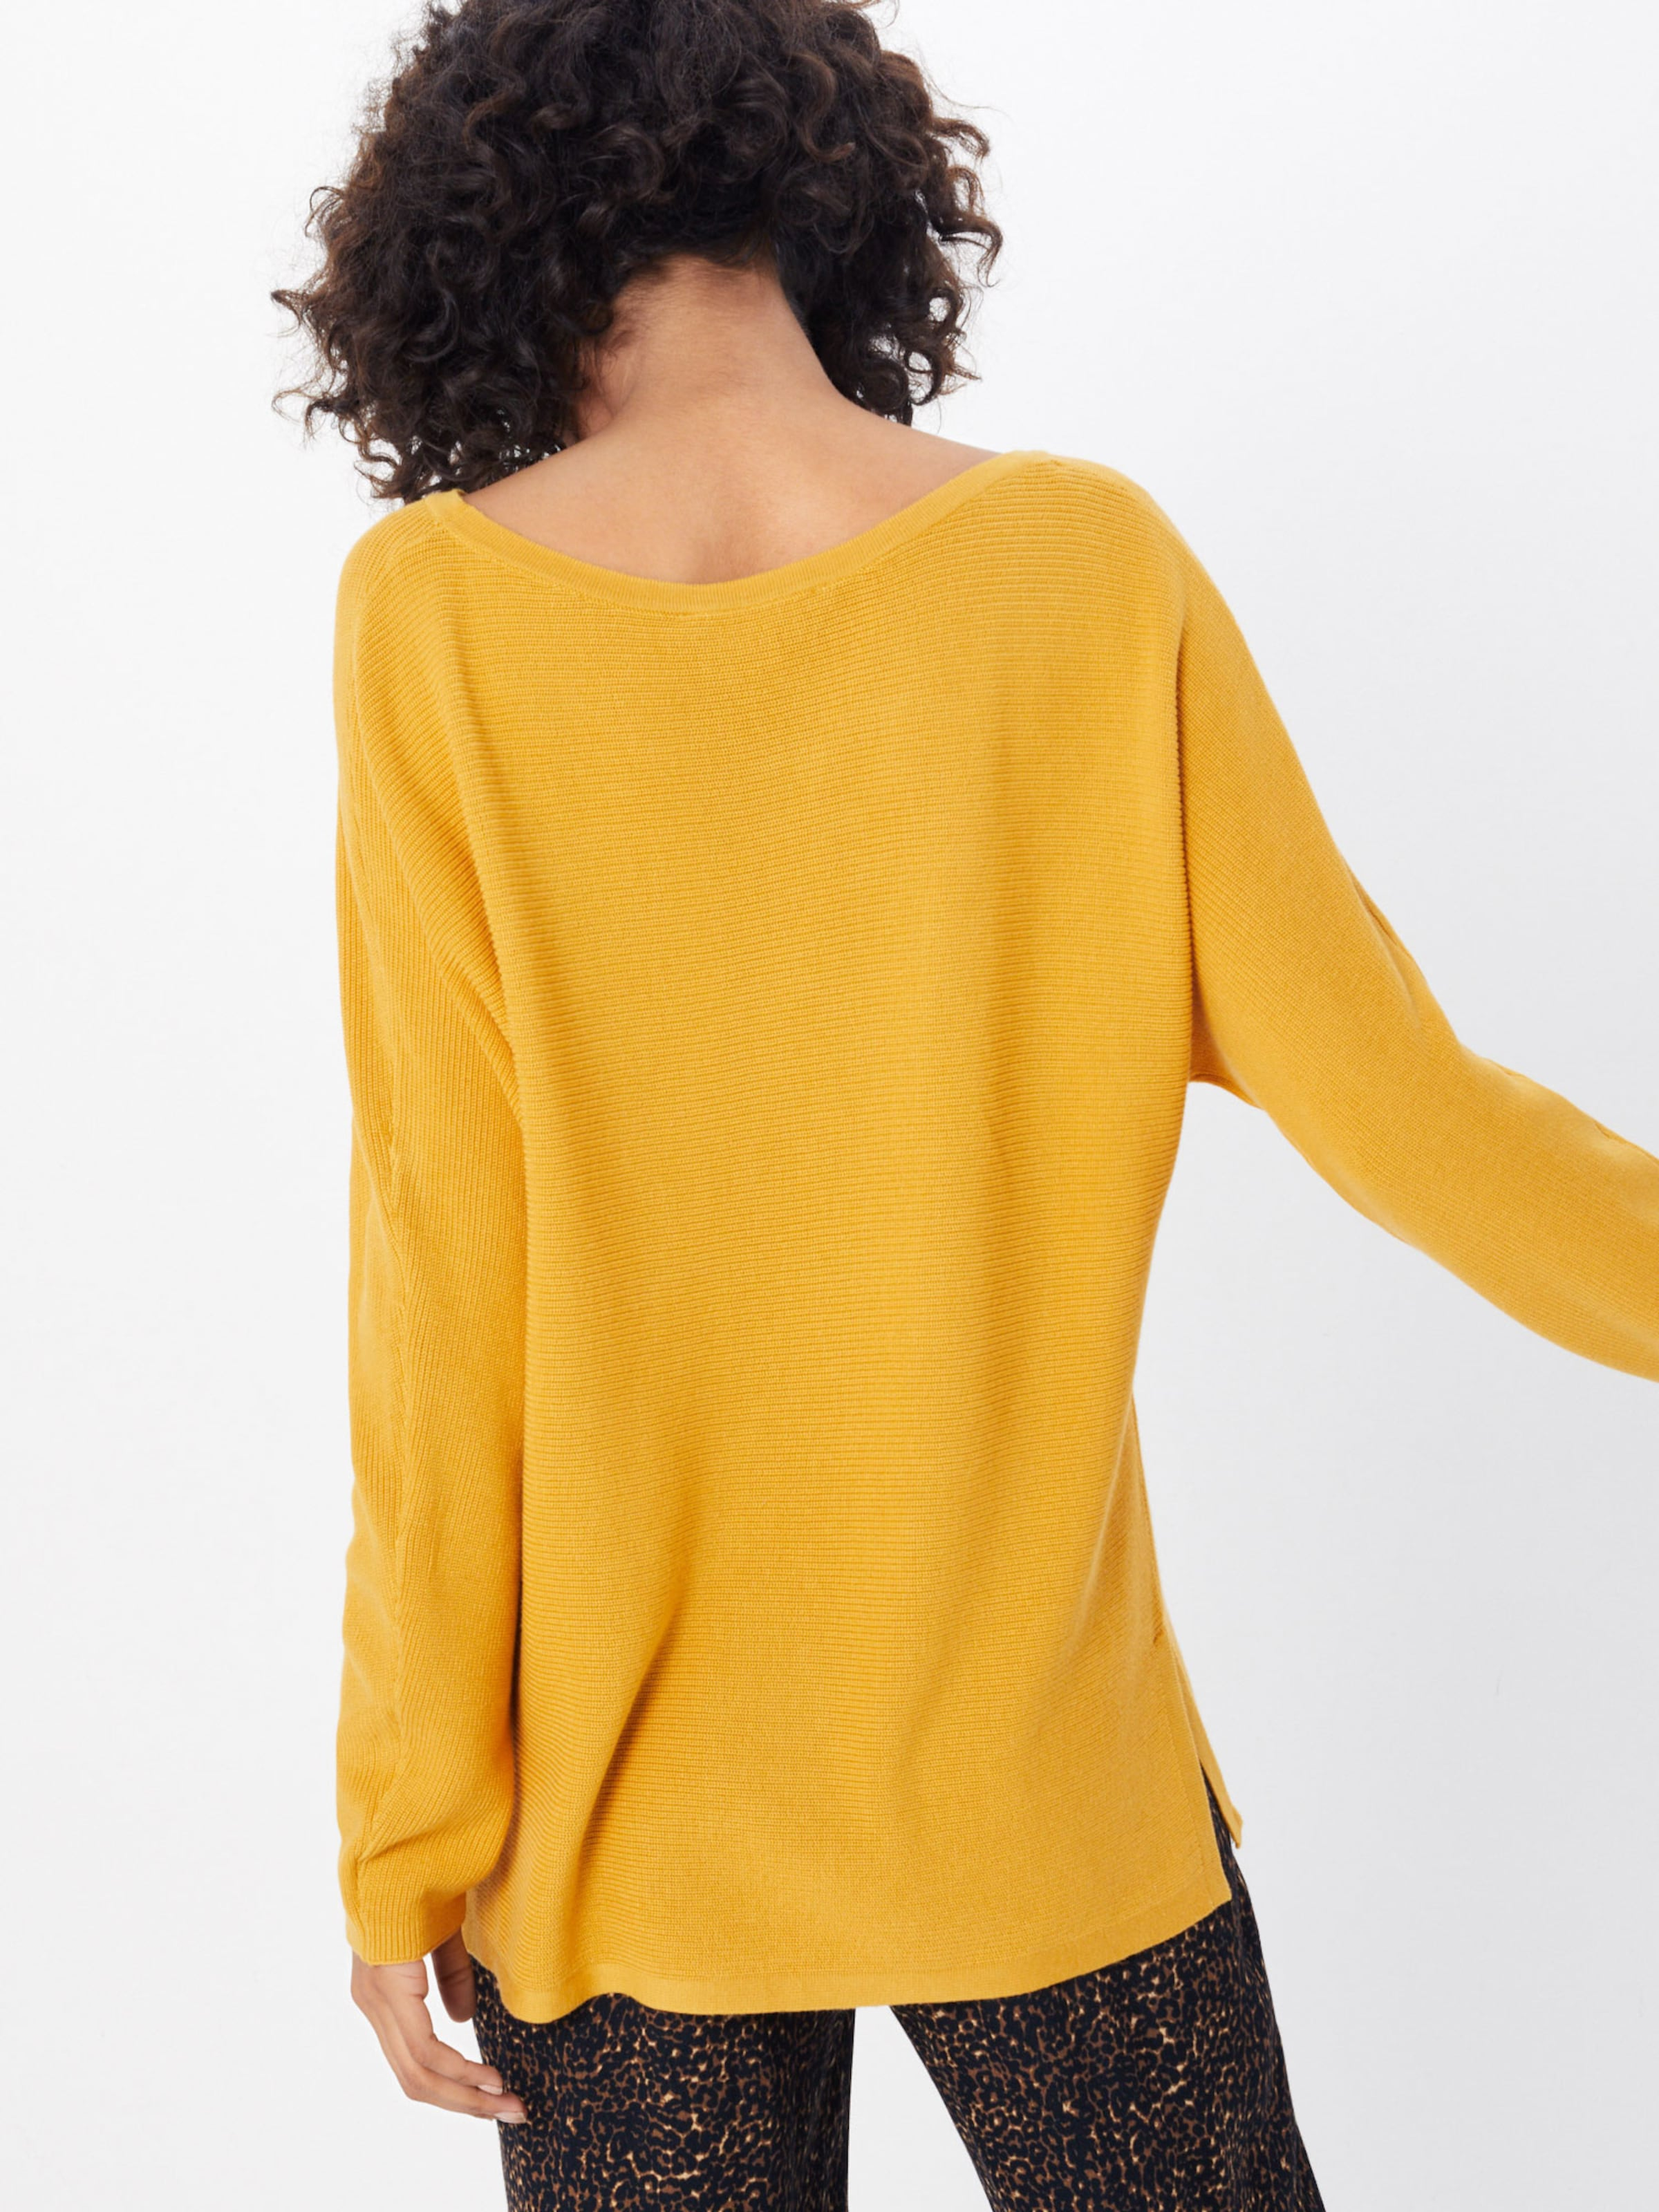 Sweaters' Sweater Pullover Esprit In 'ocs Gelb wPO0kn